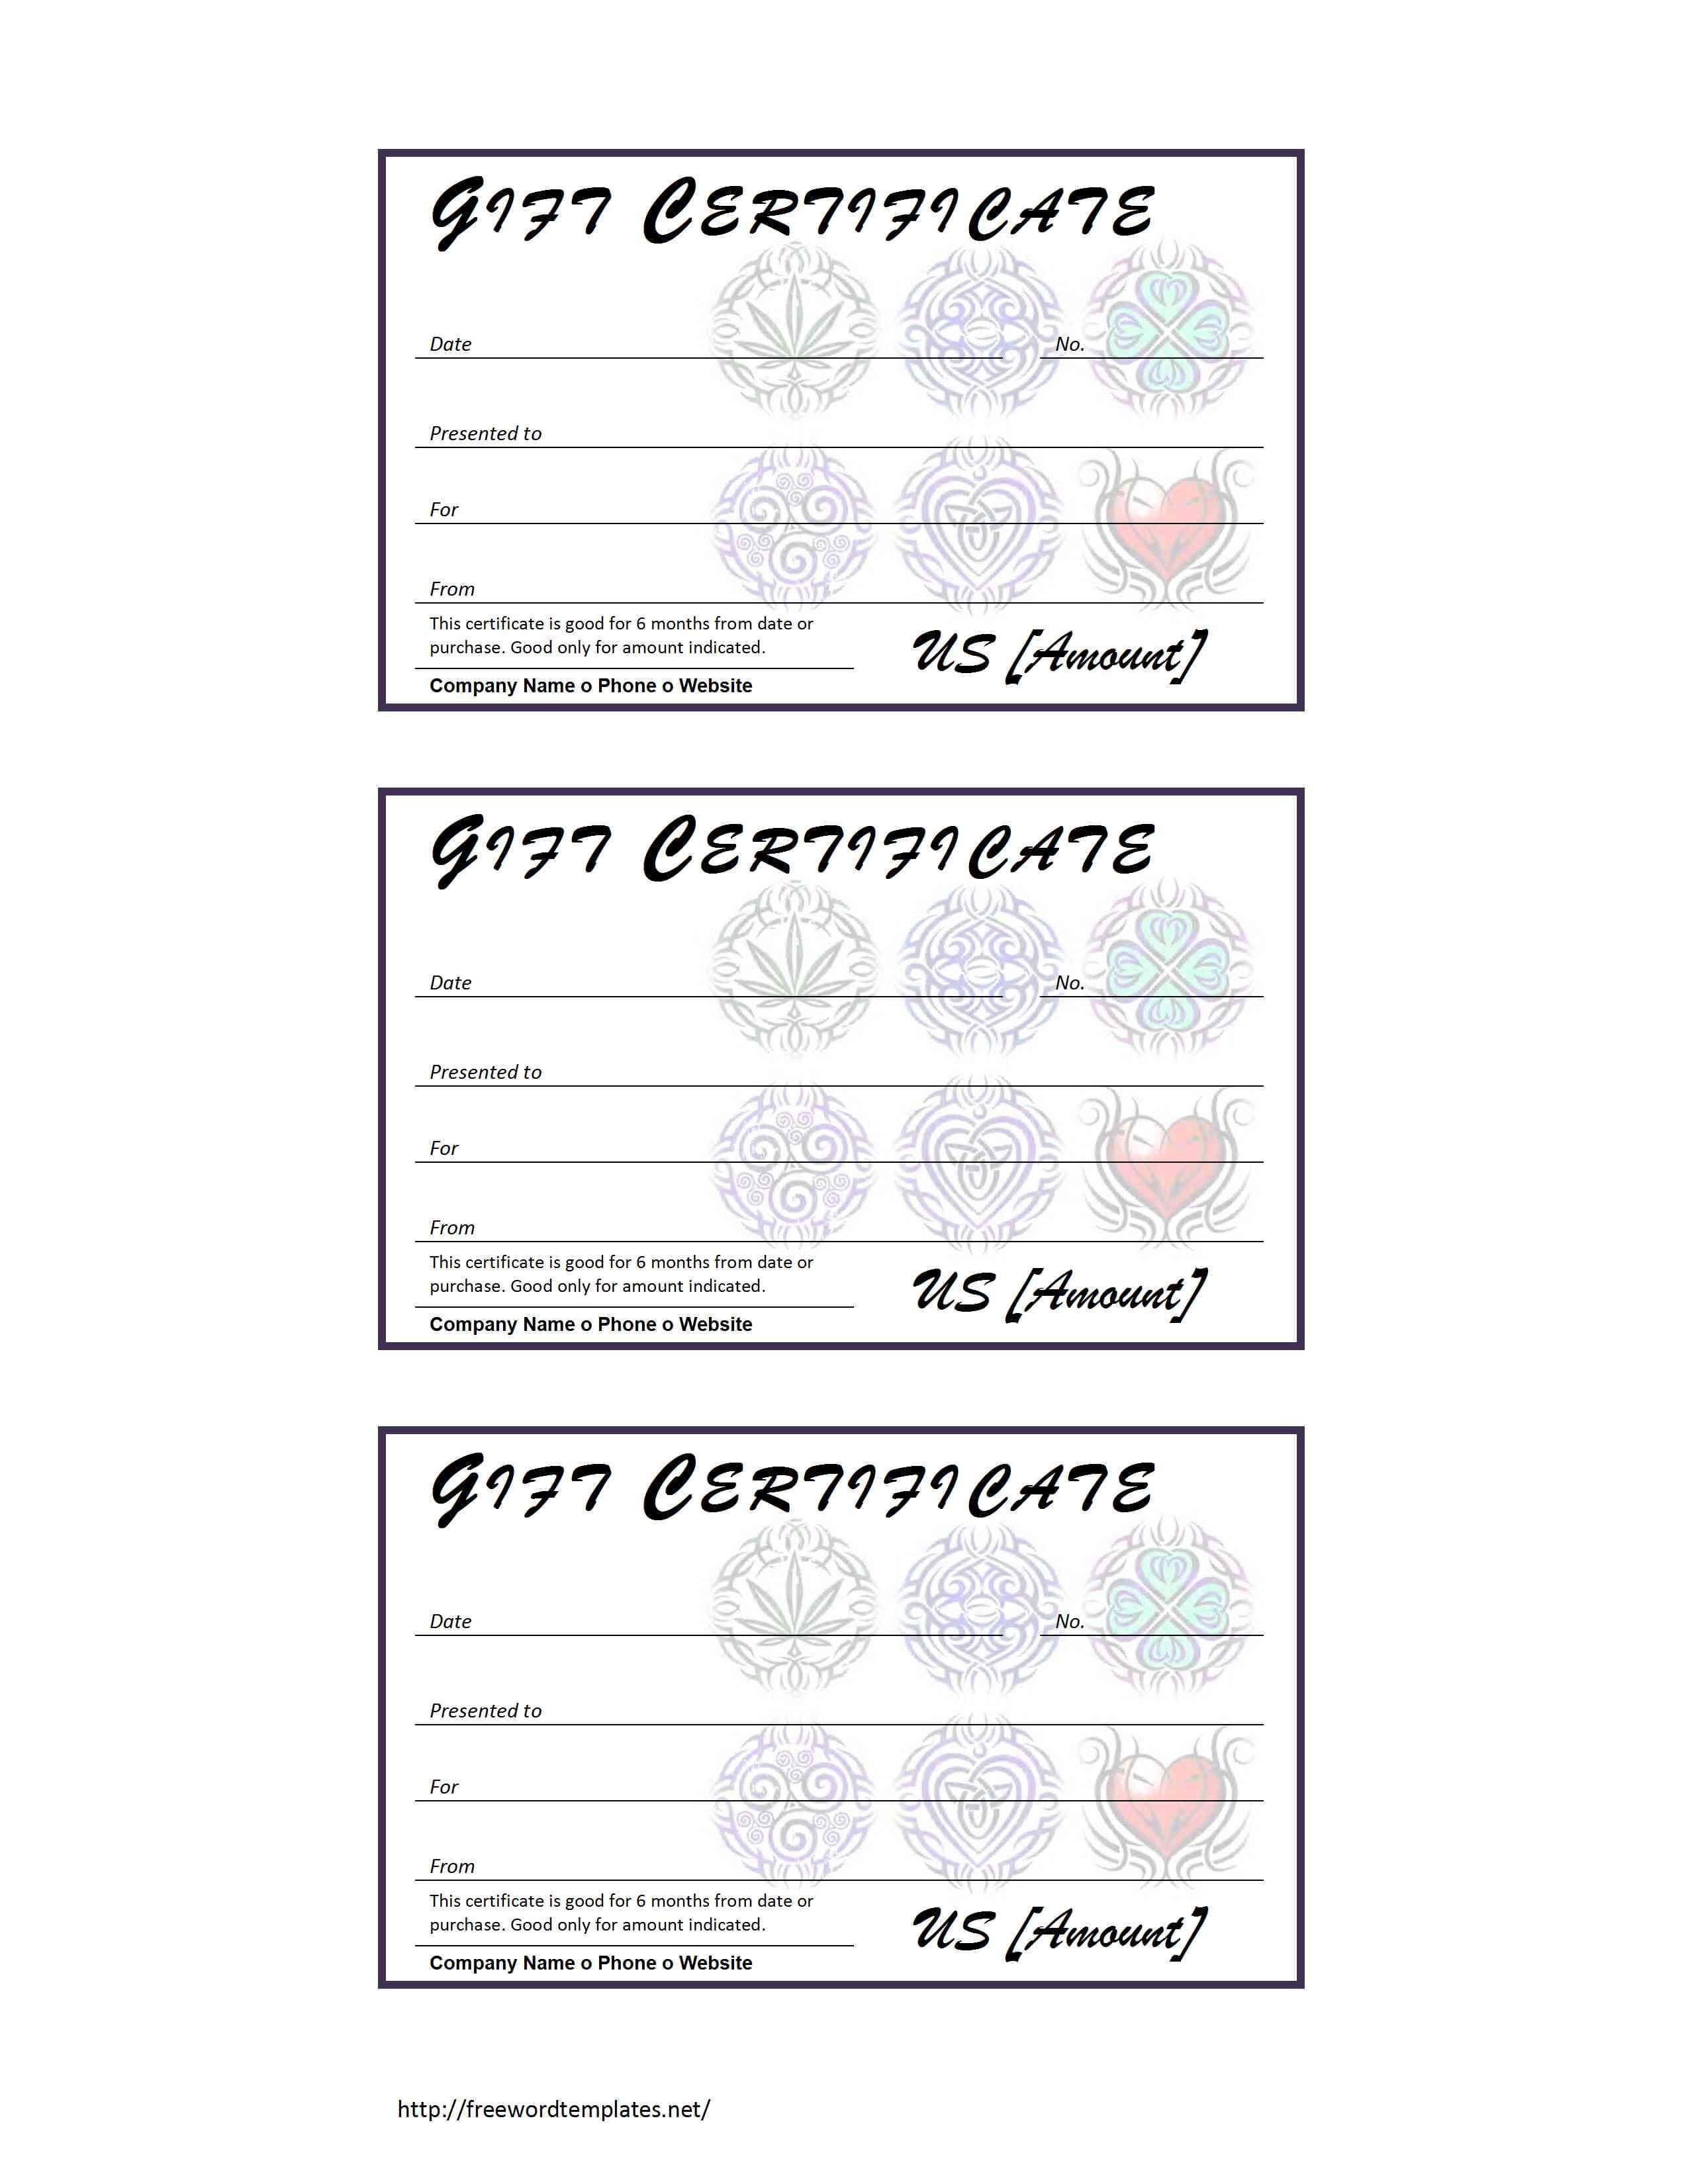 Tattoo Gift Certificate Template regarding Tattoo Gift Certificate Template